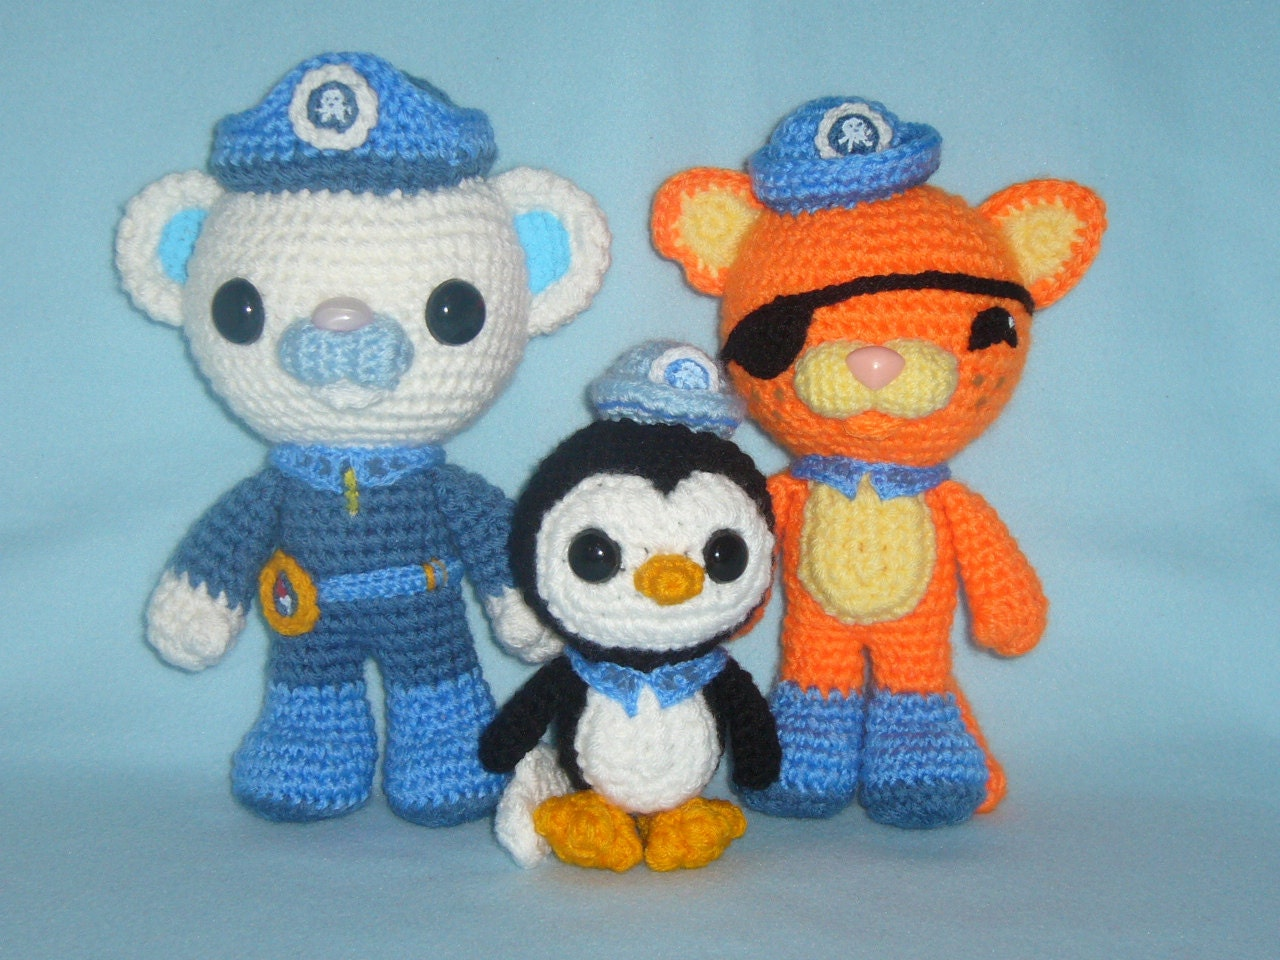 Octonauts team toys crochet patterns PDF by MarinaMandarina